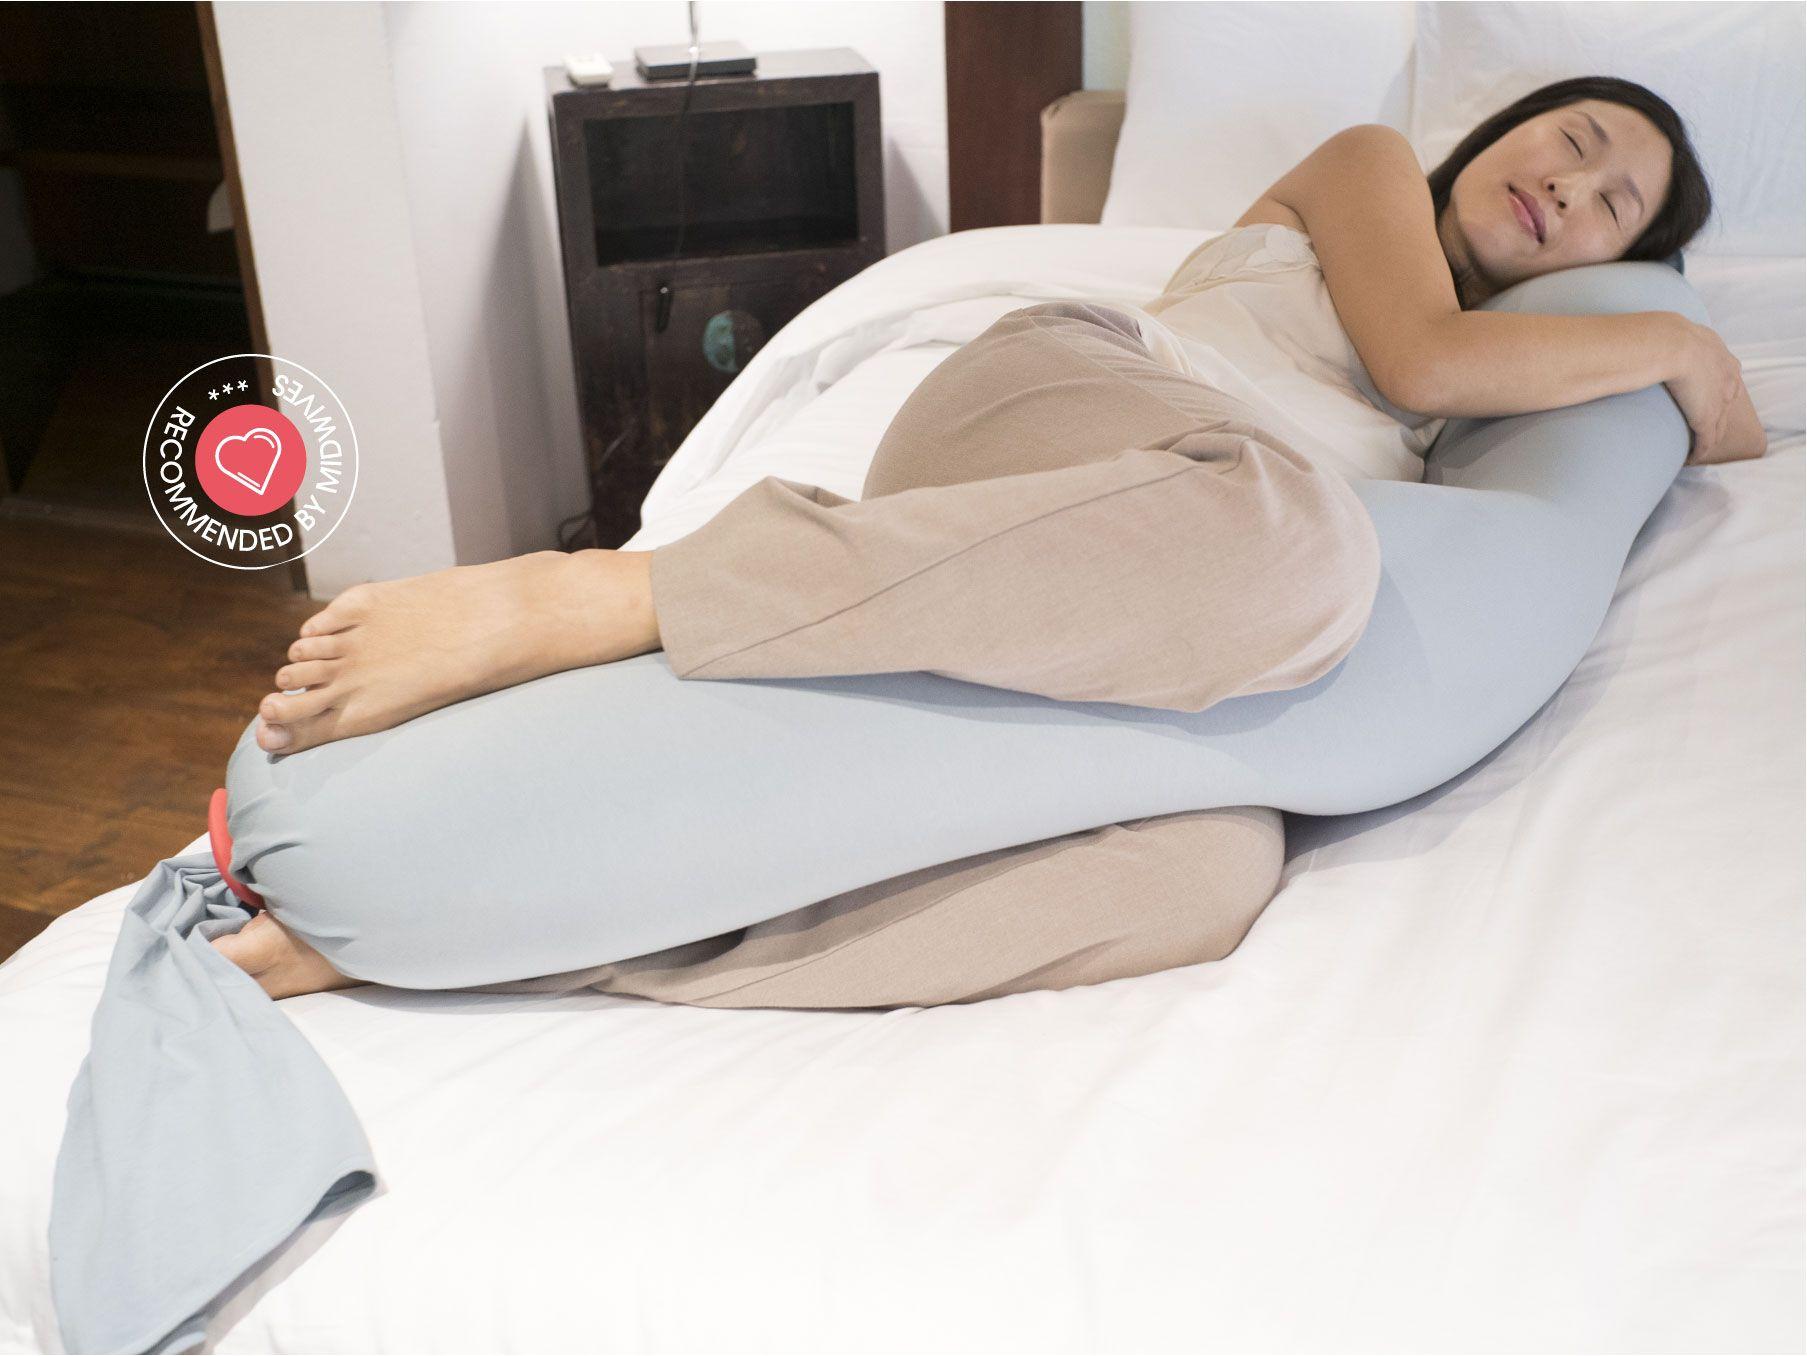 bbhugme® Pregnancy pillow ™, The Award